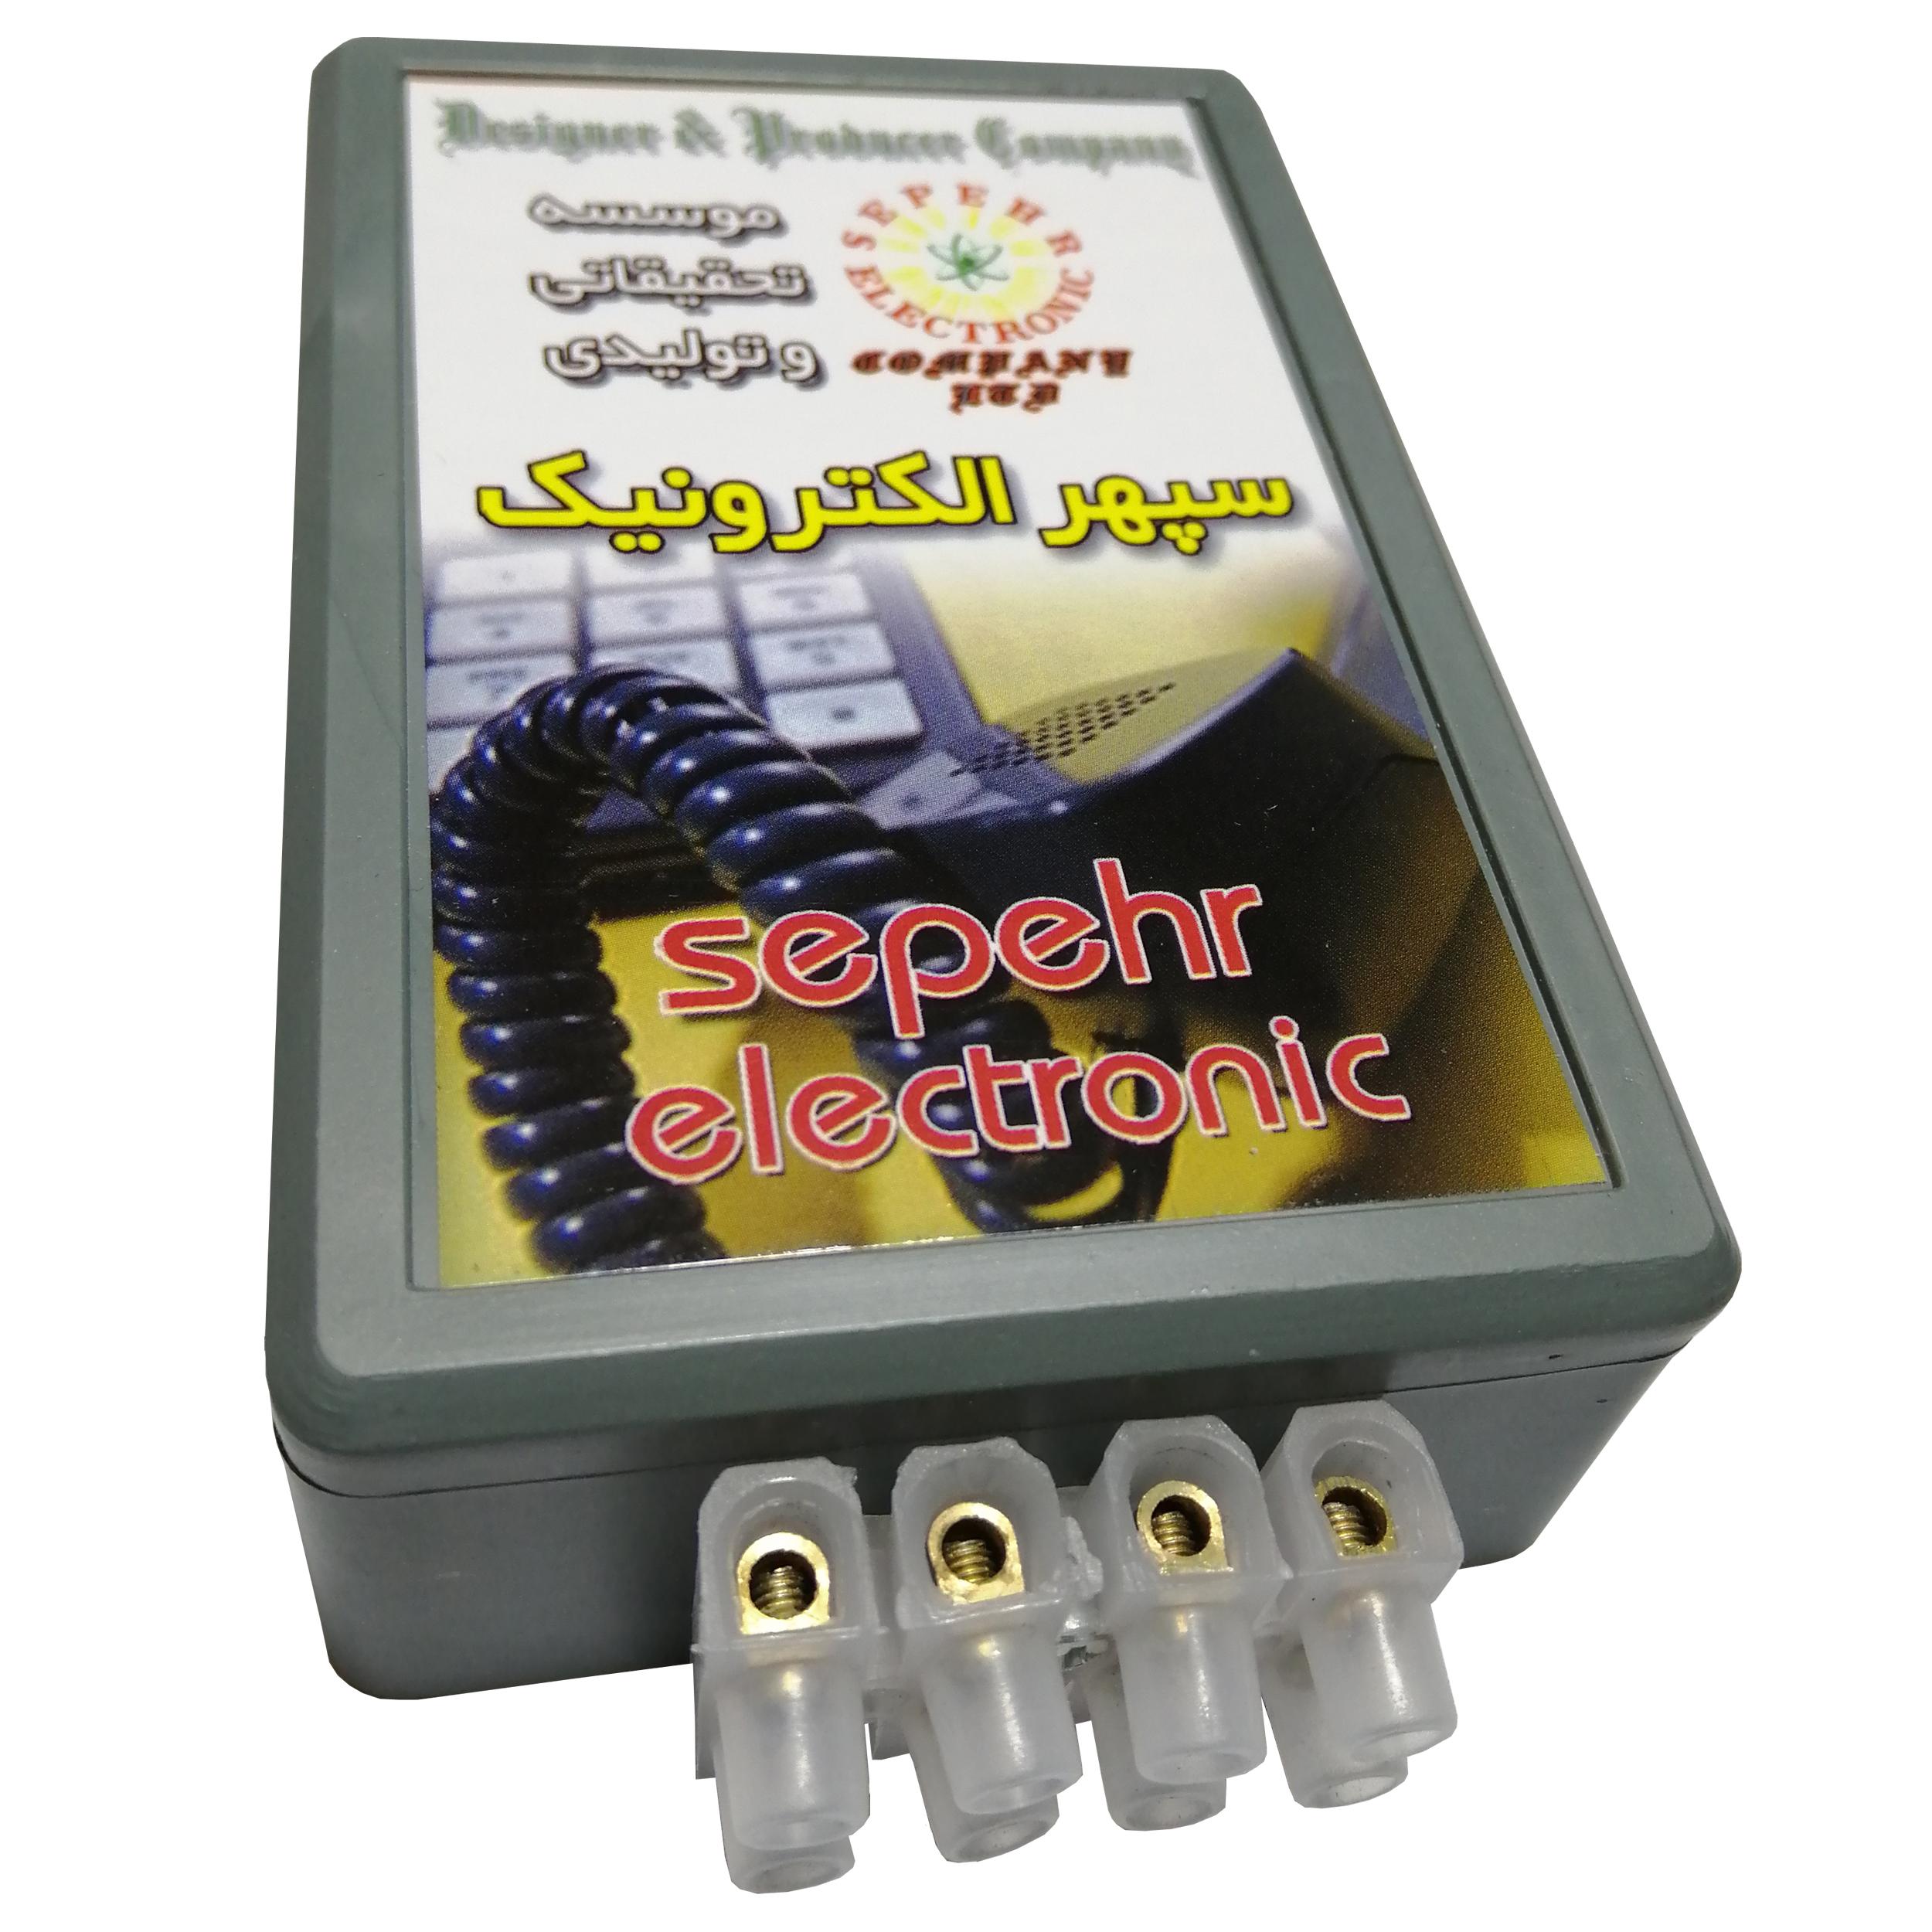 رله الکترونيکي زنگ تلفن سپهرالکترونيک مدل SE4023